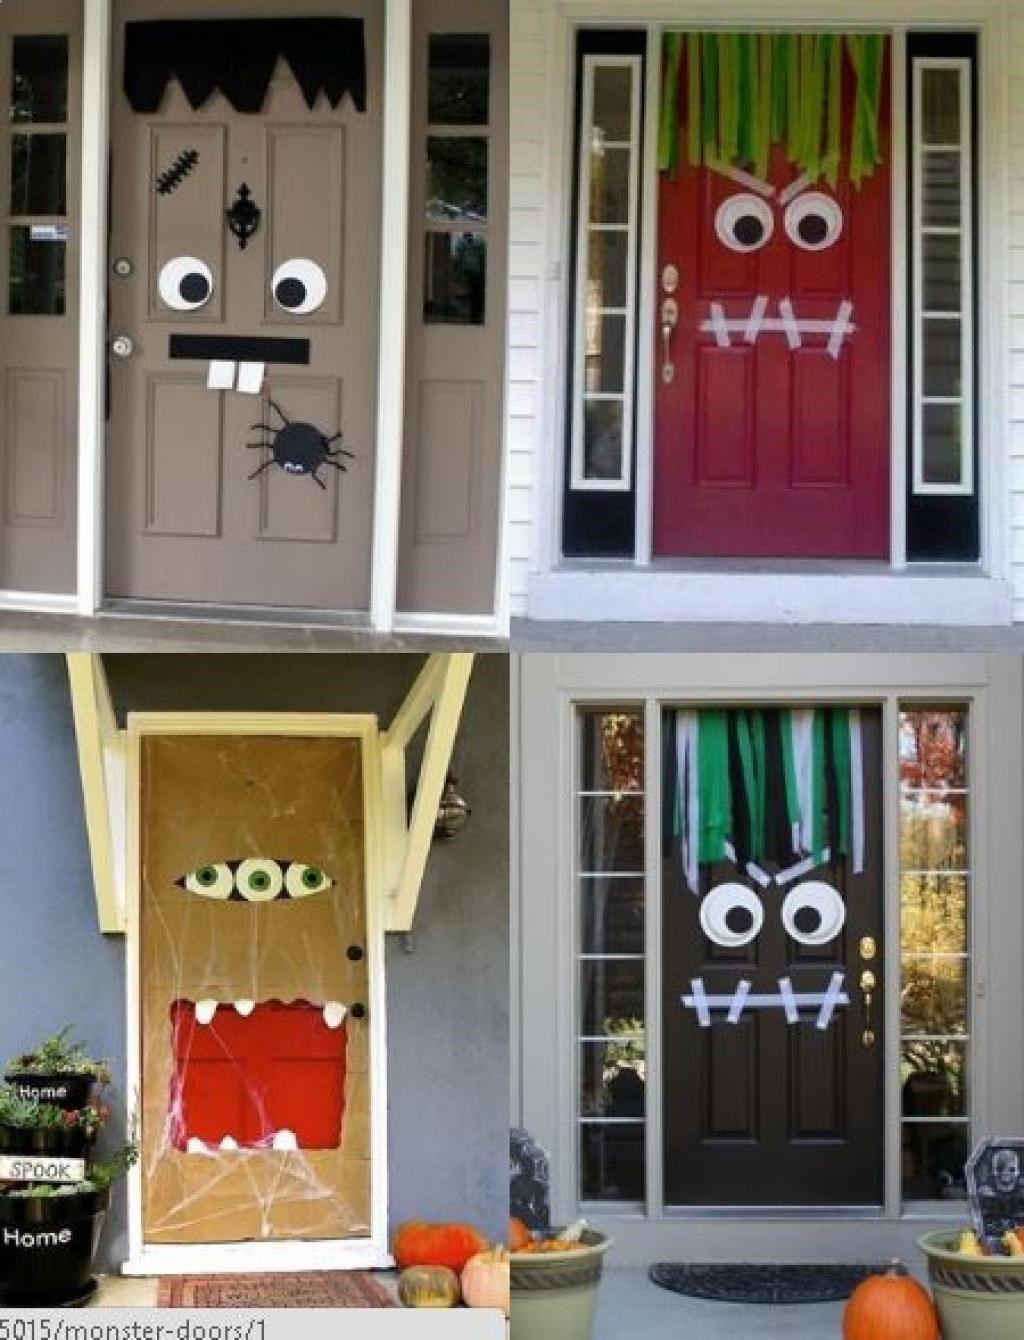 Camping Fun - Bricolages dautomne à faire avec vos petits monstres - Halloween Door Decoration Ideas